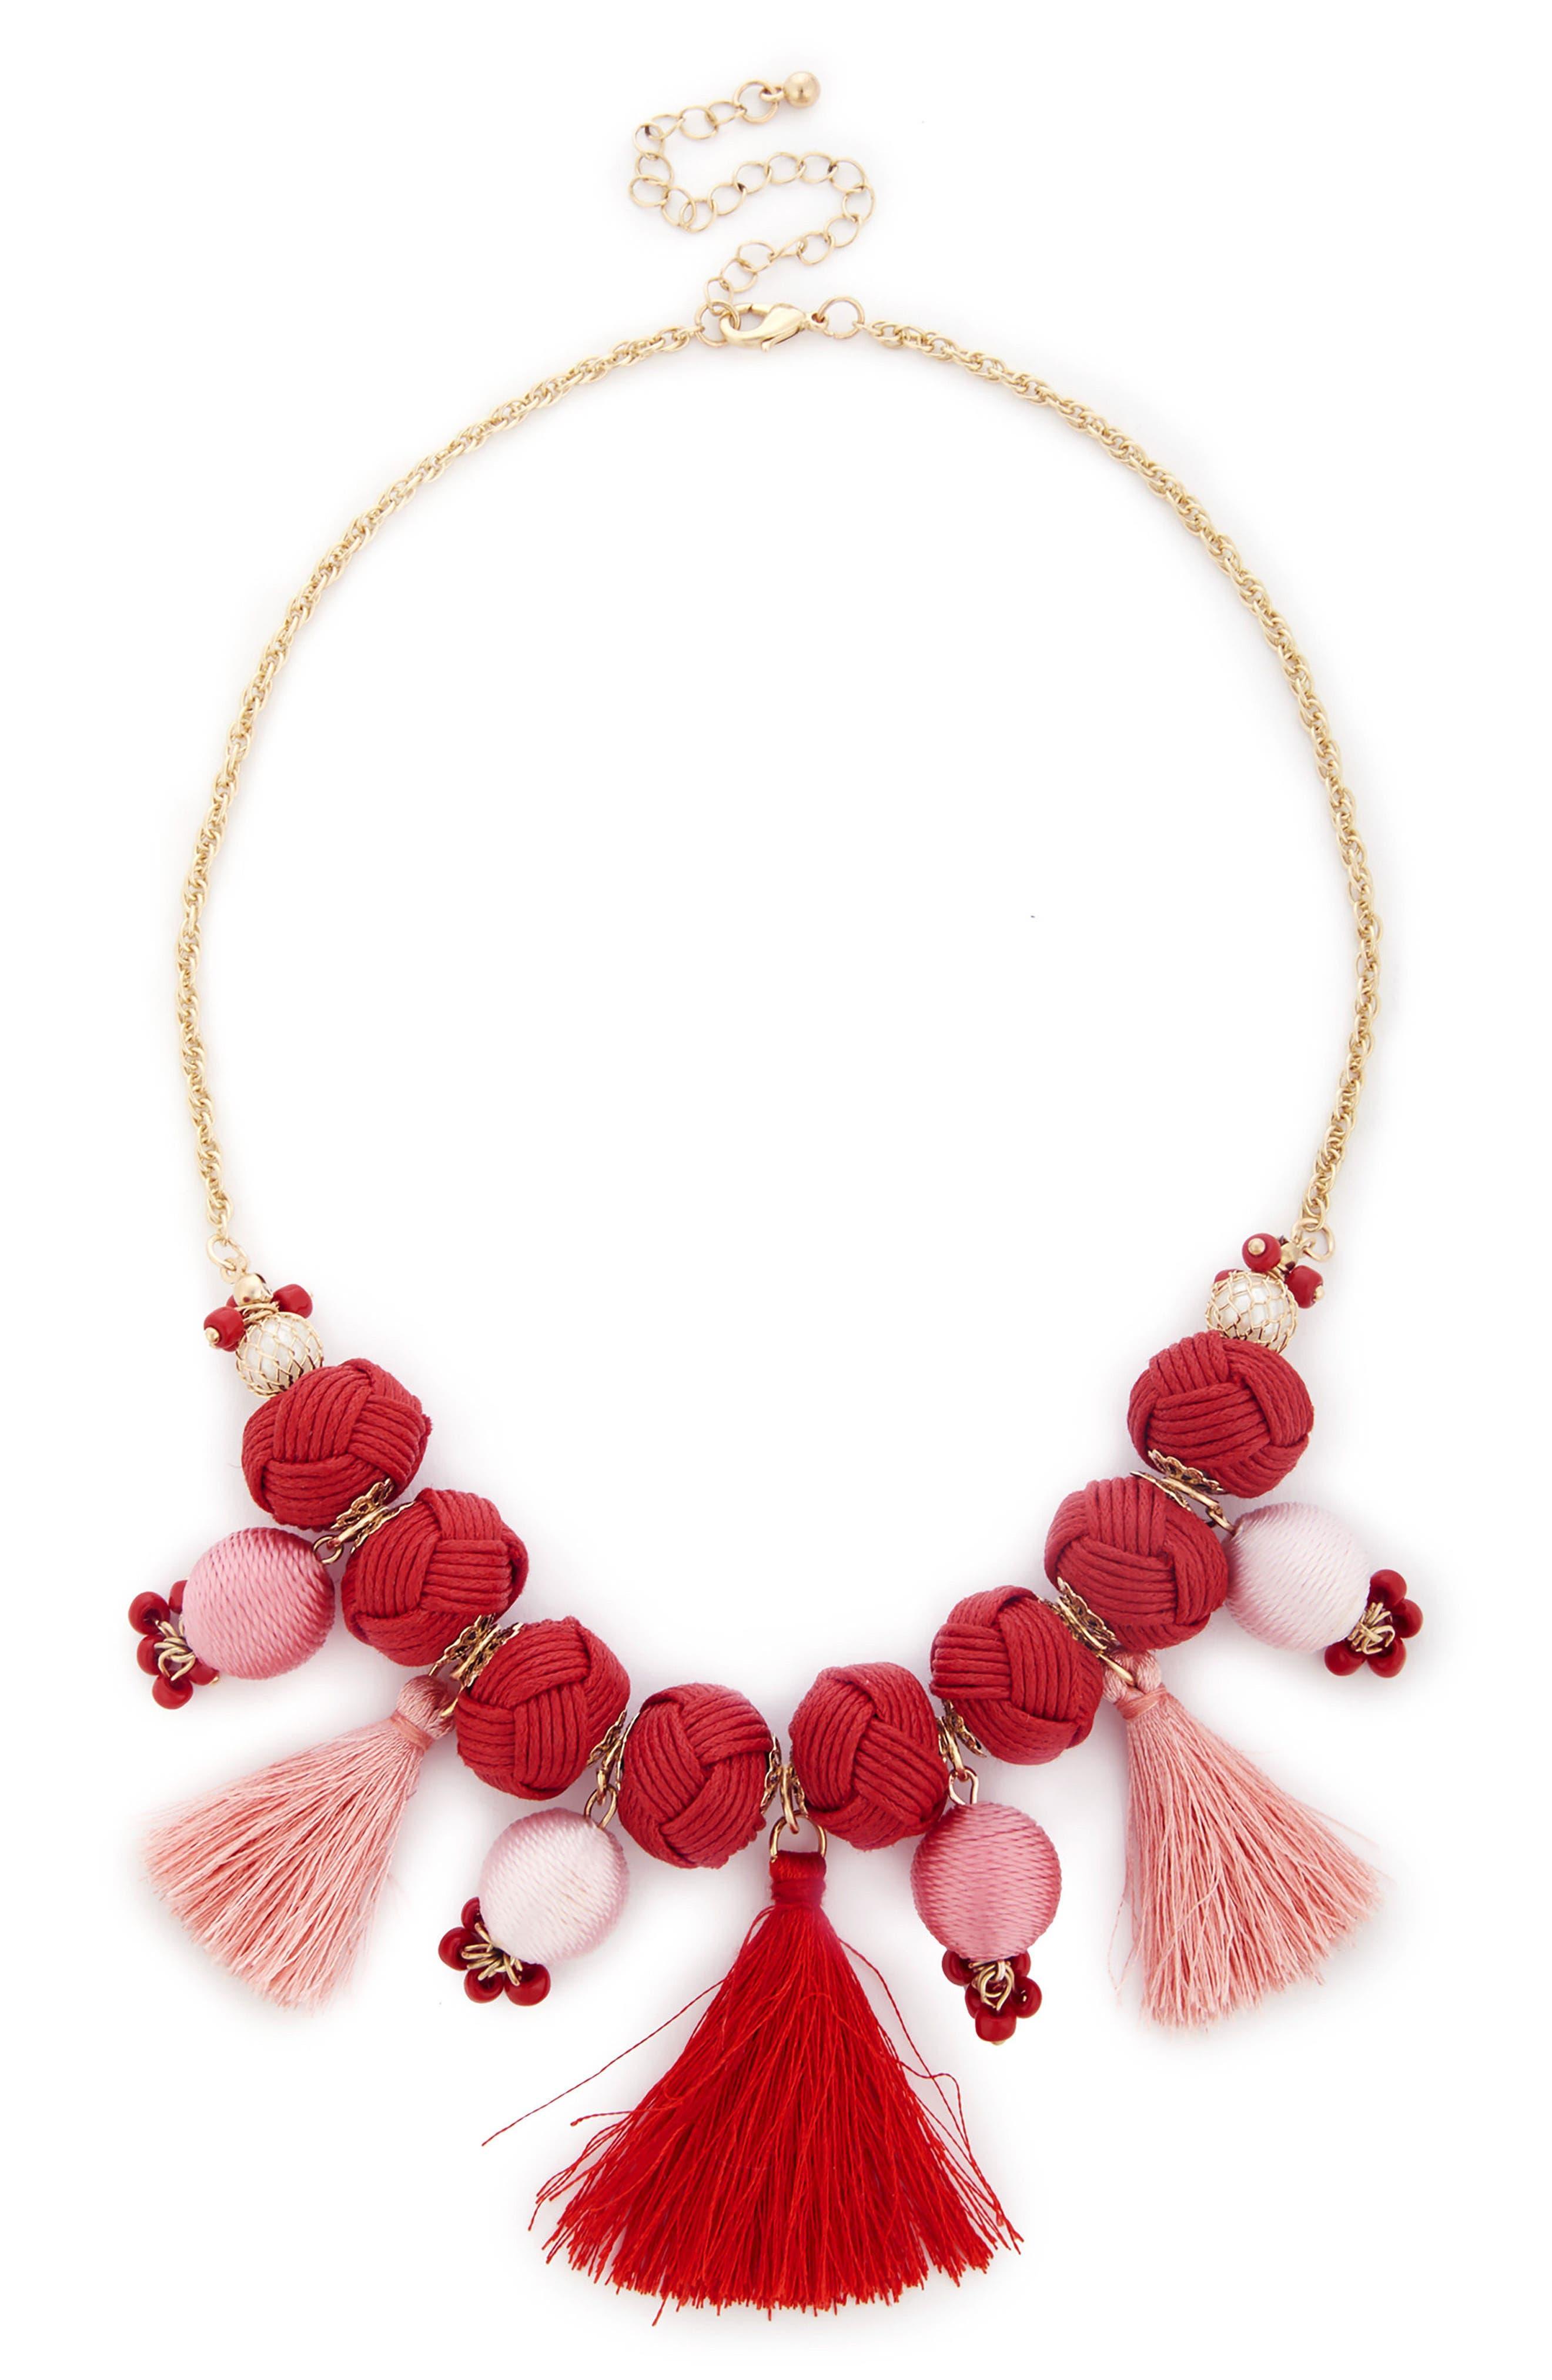 Meeko Tassel Statement Necklace,                         Main,                         color, Coral